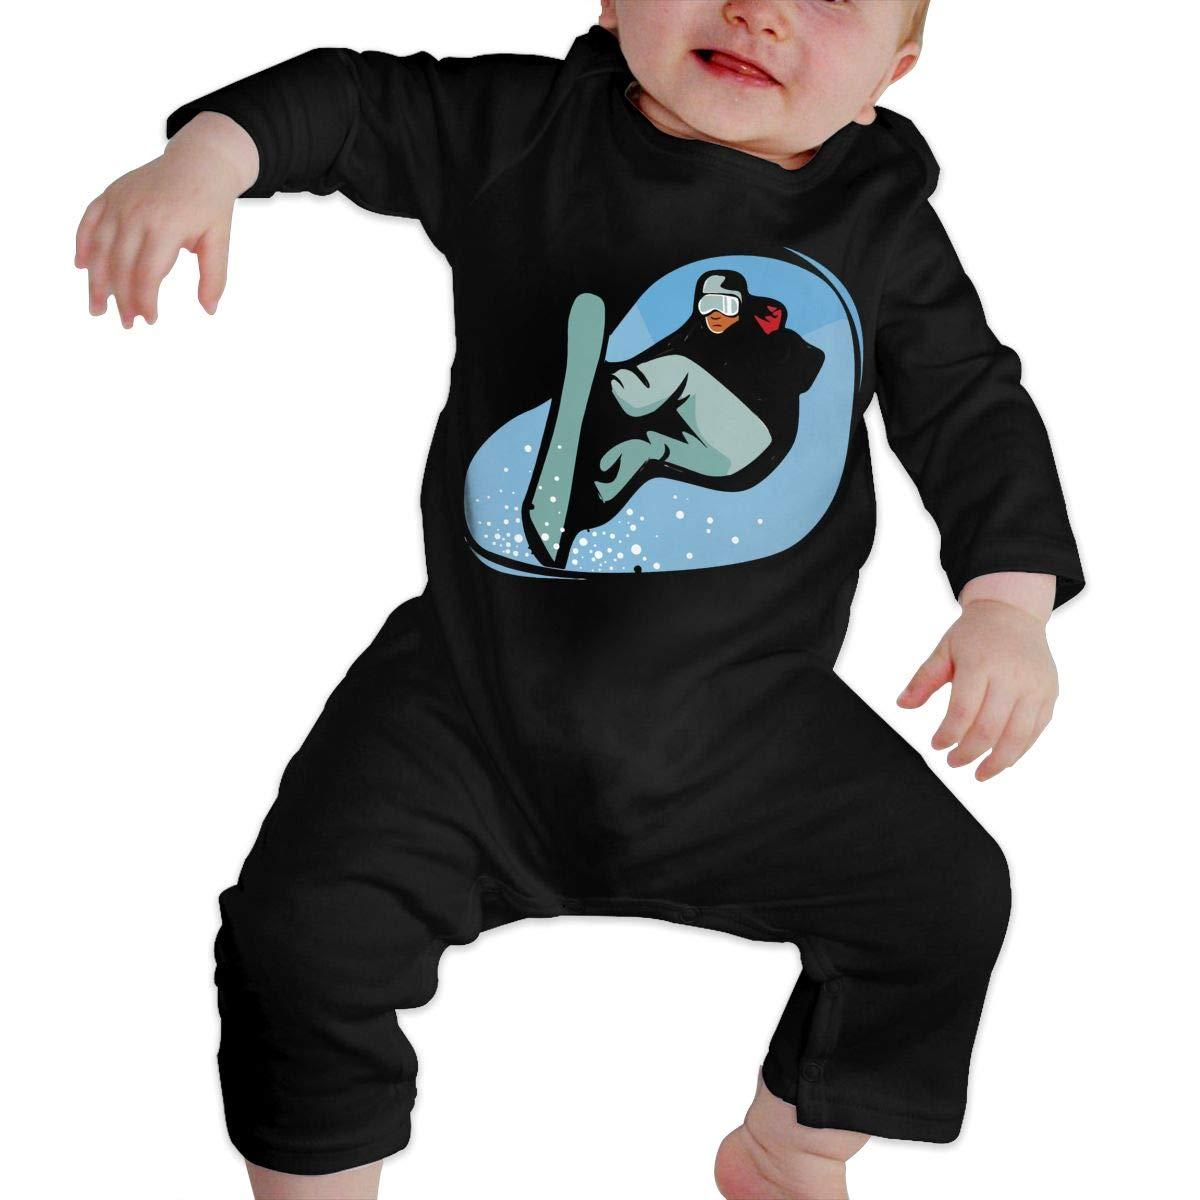 UGFGF-S3 Snowboarding Man Newborn Kids Long Sleeve Romper Jumpsuit Coverall